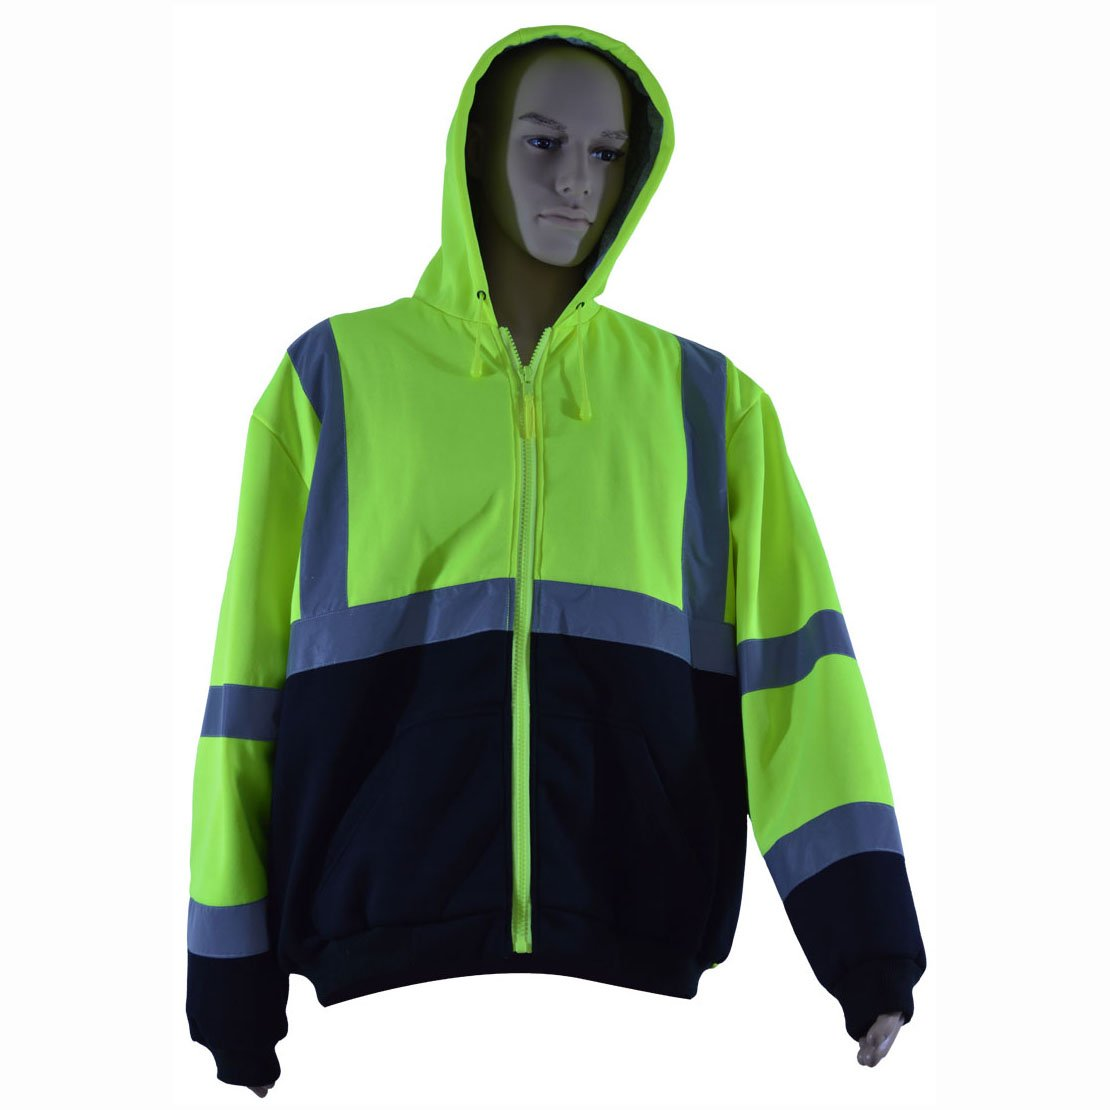 Petra Roc LBHSW-C3-S Thermal Lined Sweatshirt Hoodie Lime/Black Two Tone, ANSI 107-Class 3, 2 Slash Pockets, Zipper Closure, S